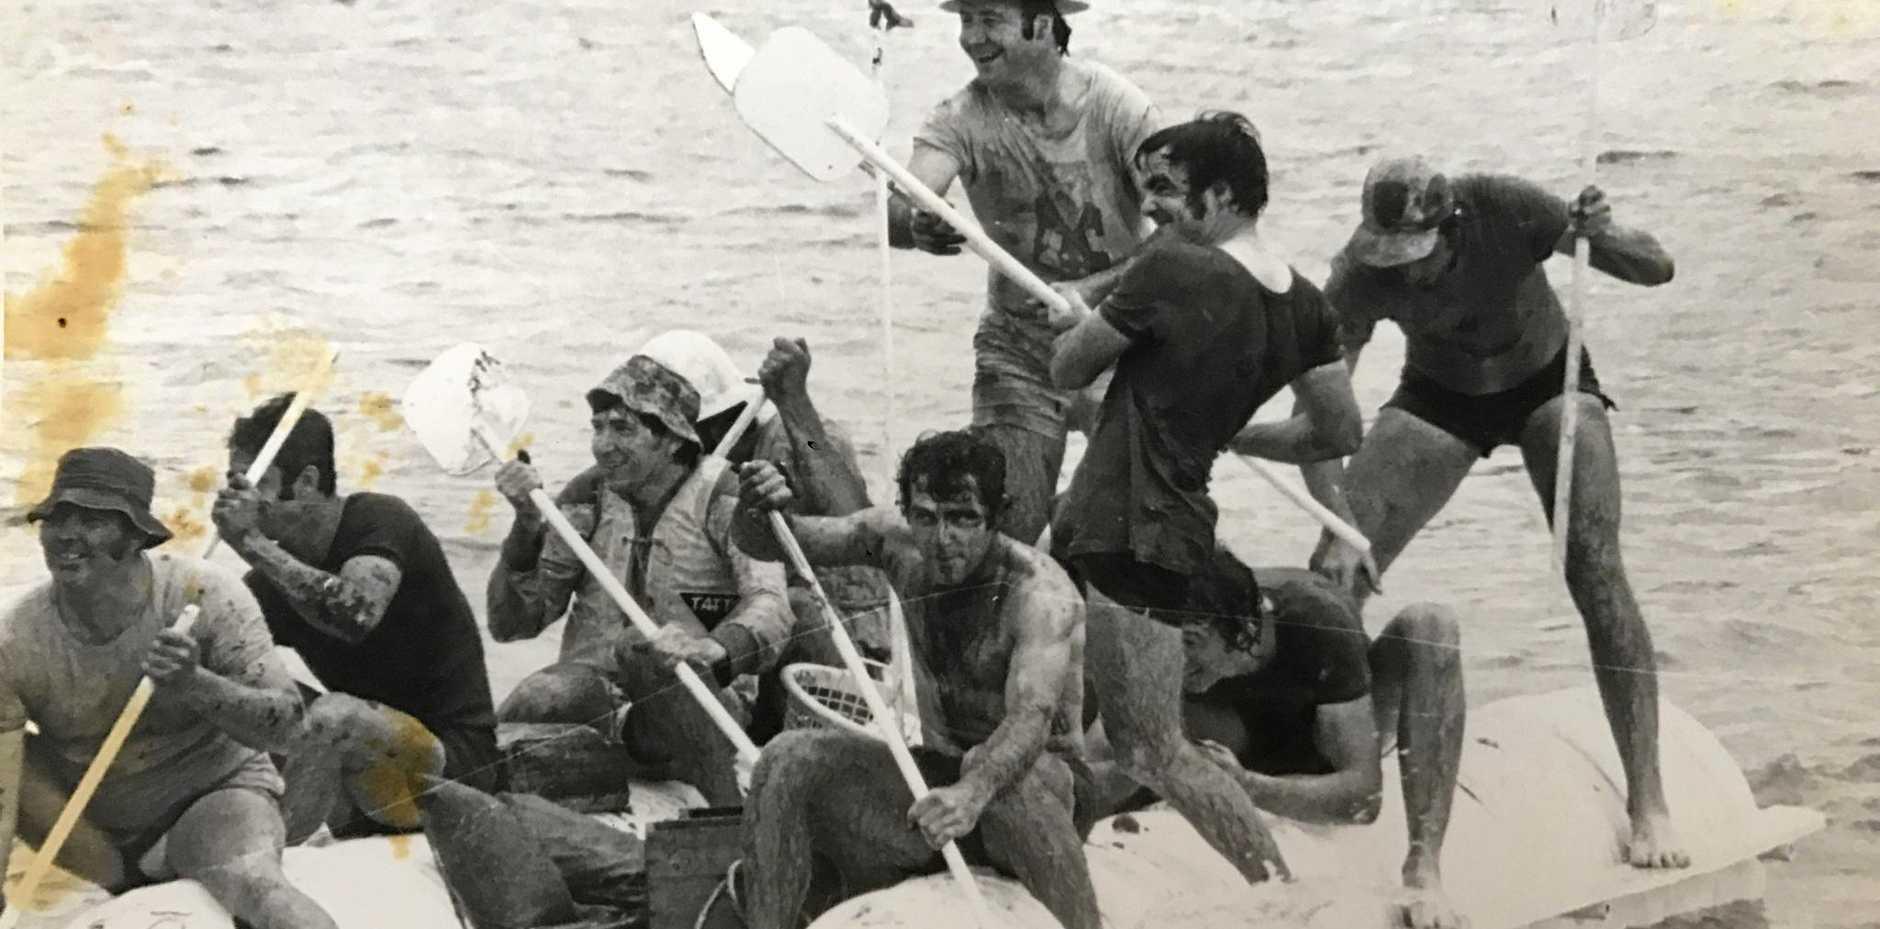 Millaquin Sugar raft crew was Pat Wise, Mick Murdock, Graham Brewer, Cam Smith, Lou Muller, Viv Sauer, Jeff Pritchard, Jeff Jonas and Ian Wright.